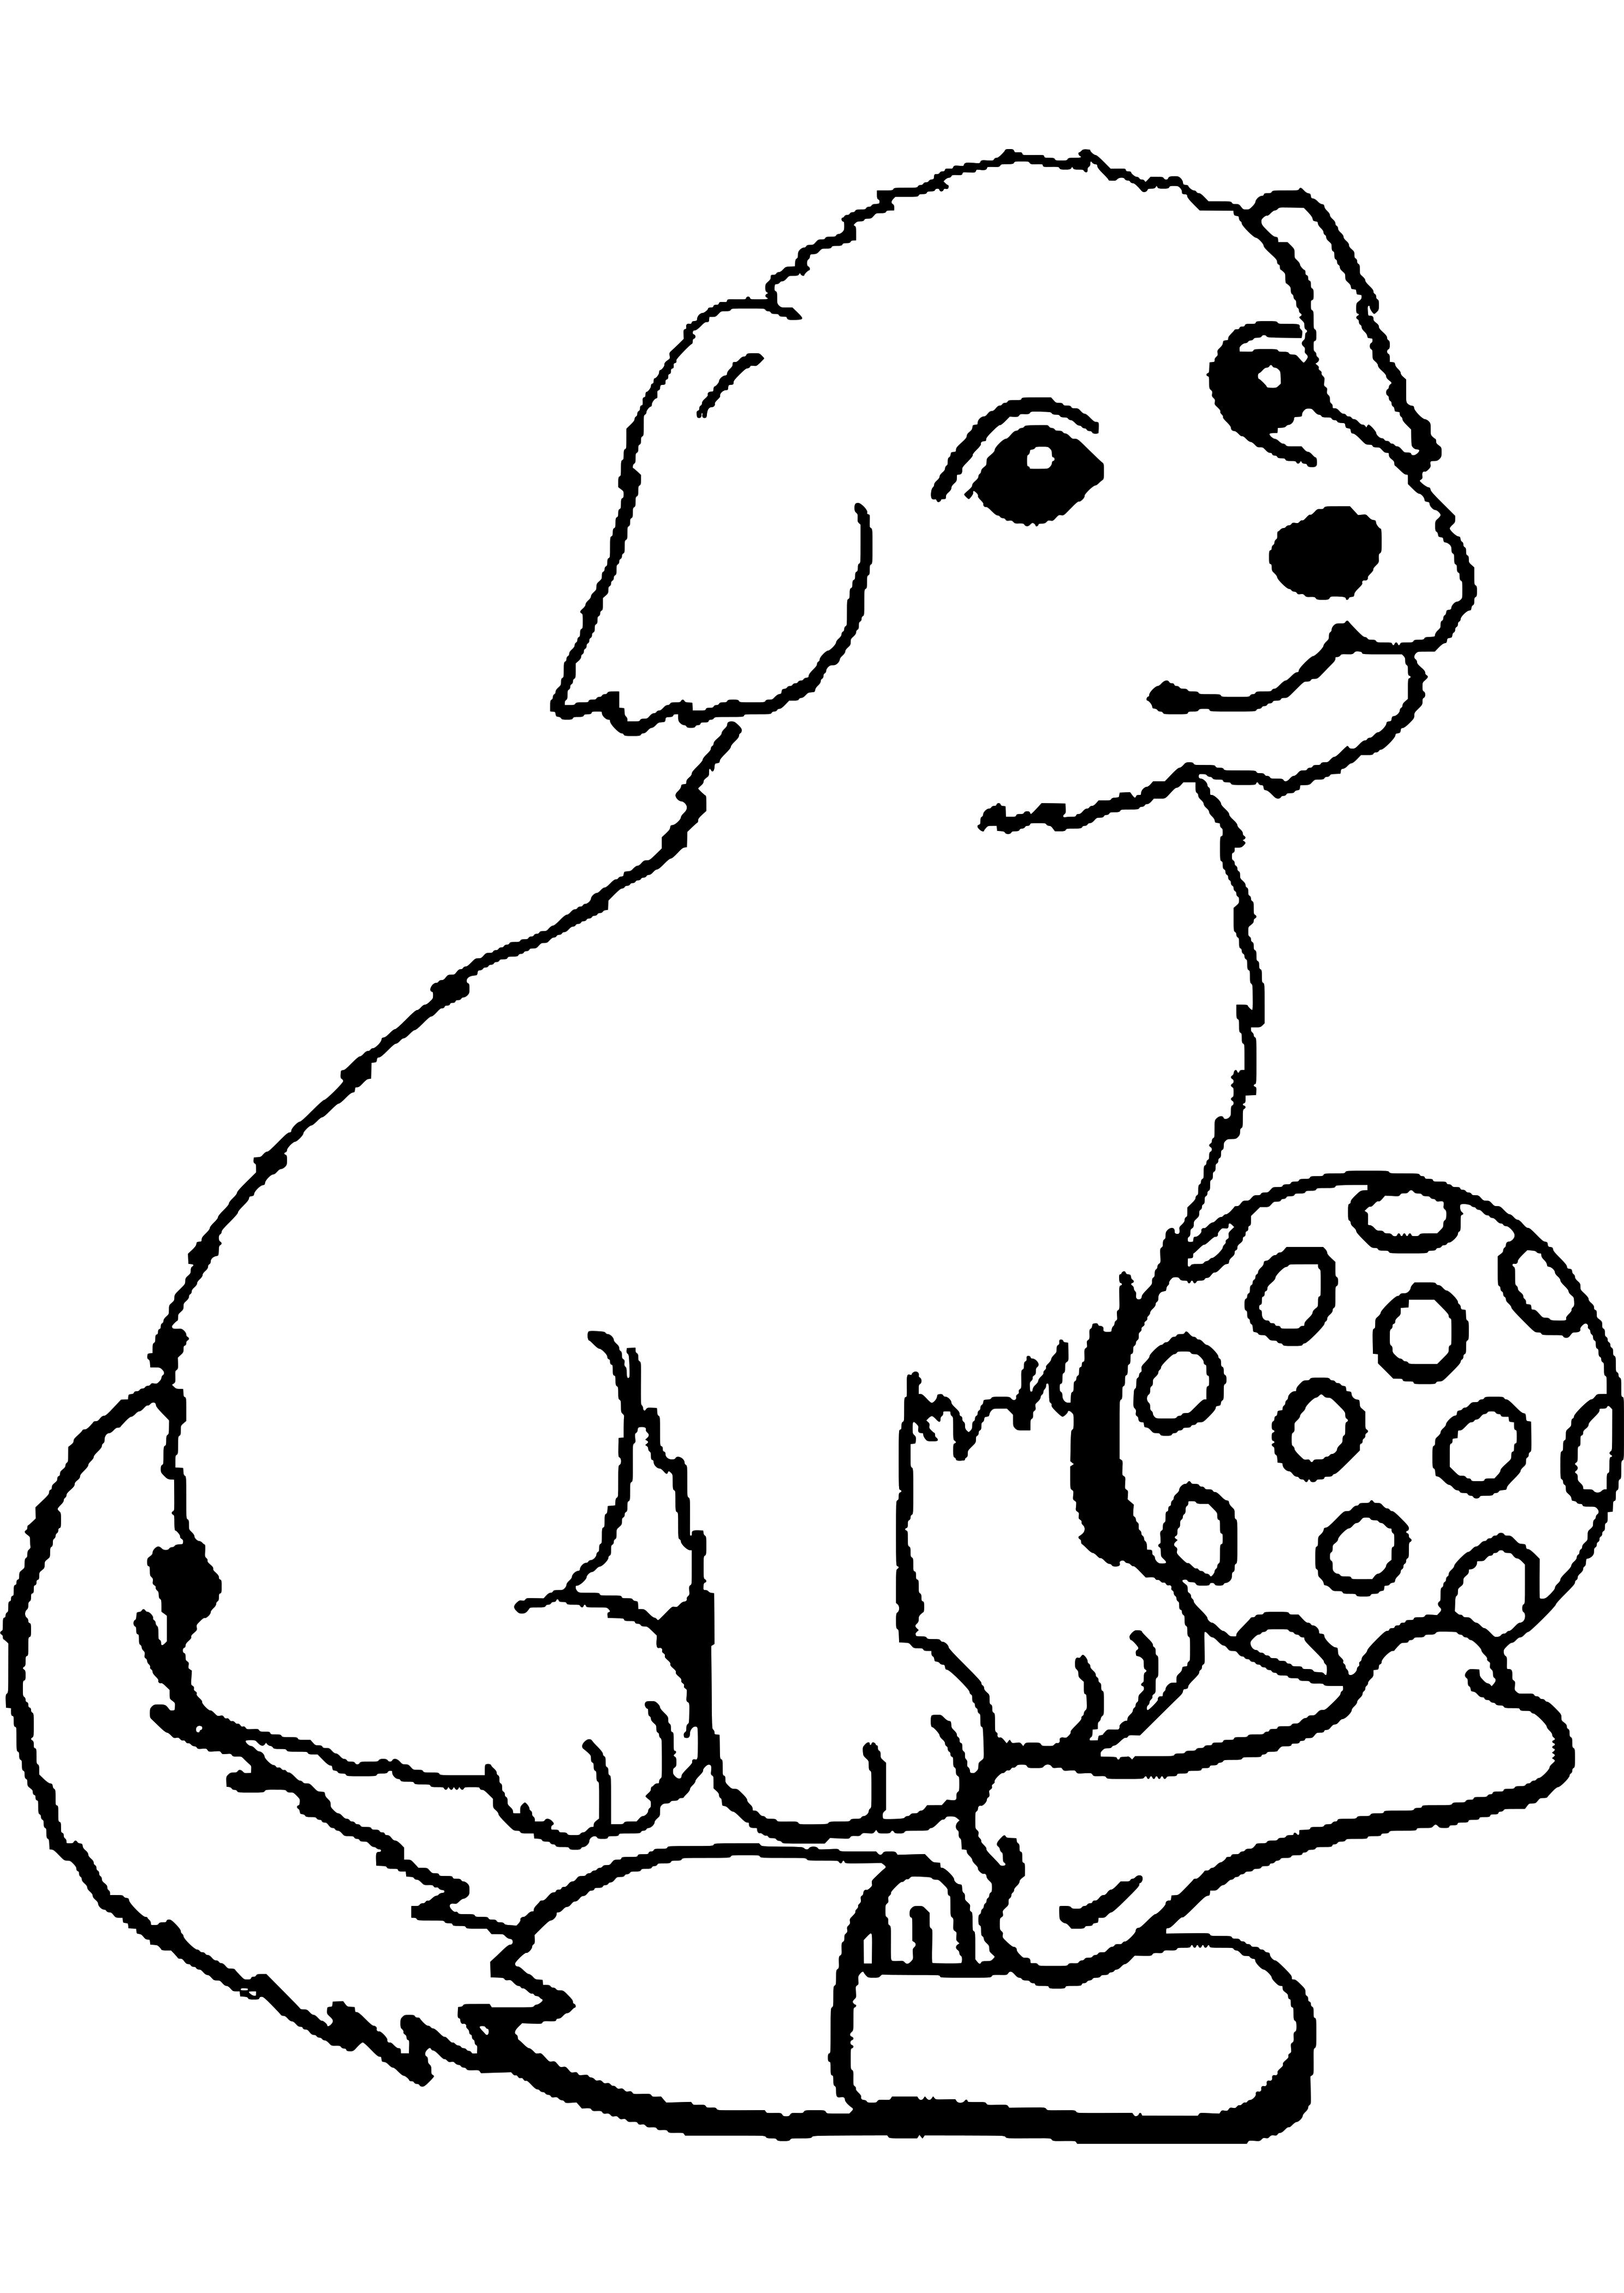 Hunde Ausmalbilder Ausmalbilder Hunde Ausmalbilder Hunde Malvorlage Hund Ausmalbilder Tiere